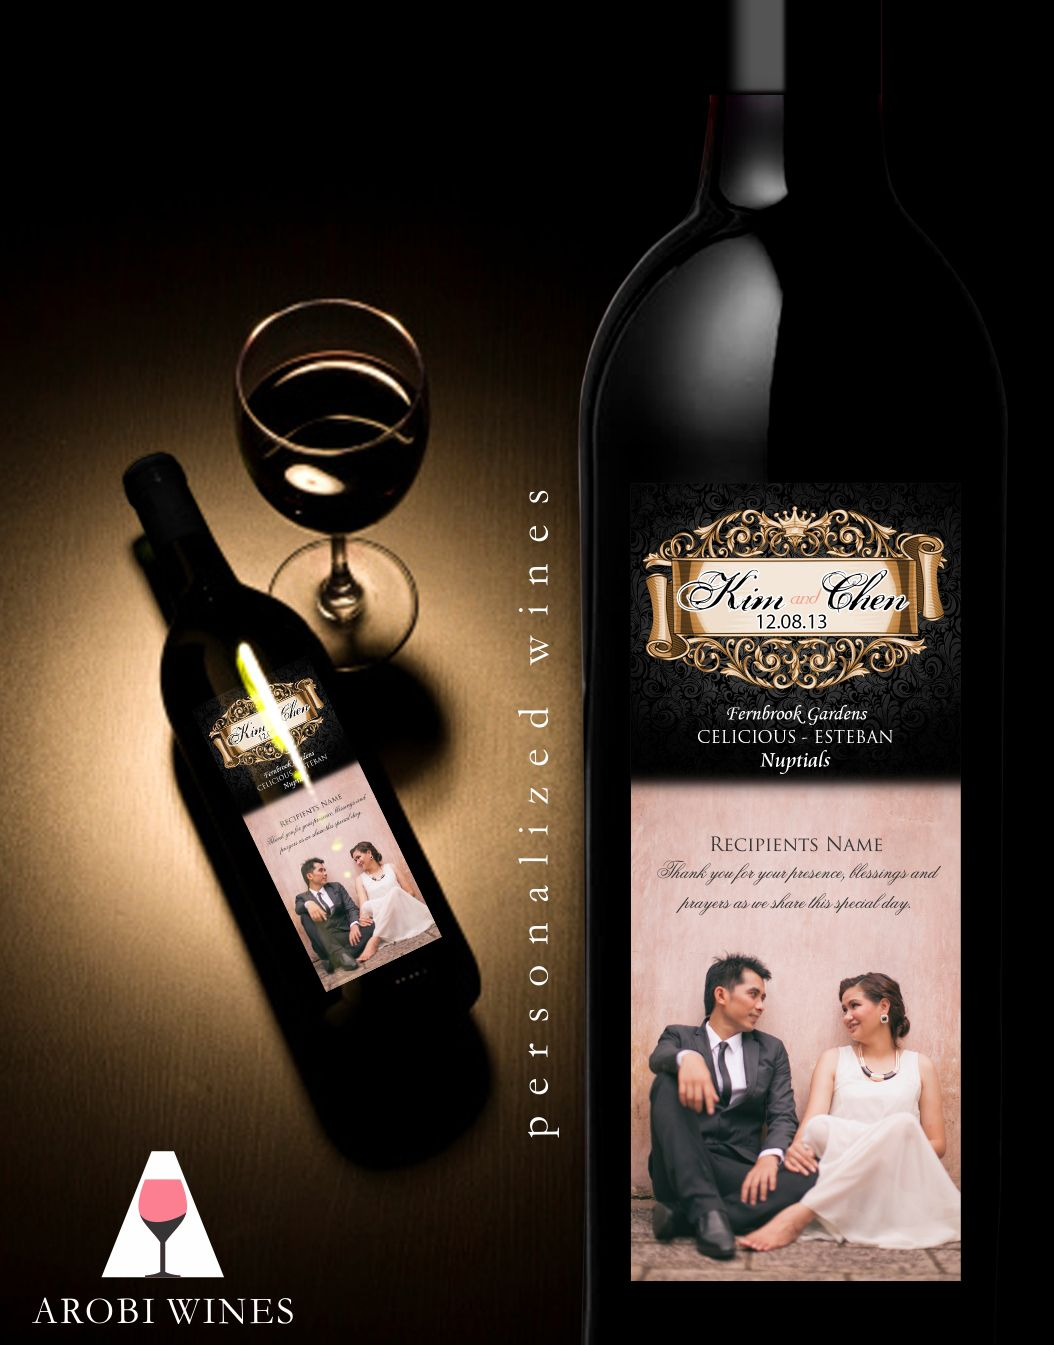 Arobi Wines Facebook Wine Wedding Souvenir Wine Wedding Wine Gifts